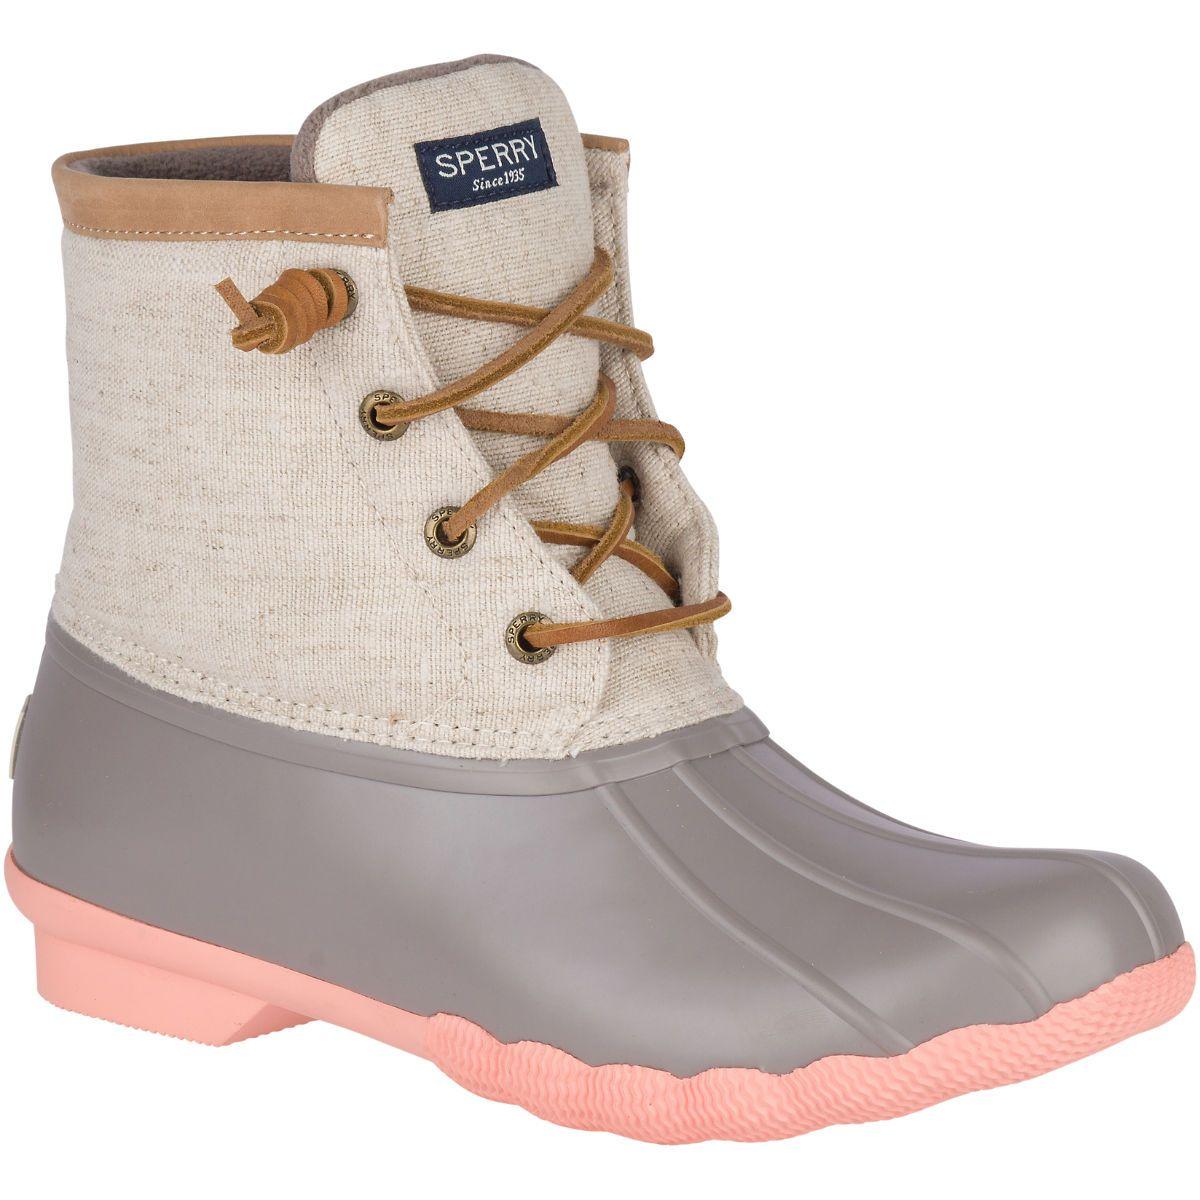 Duck boots, Sperry duck boots